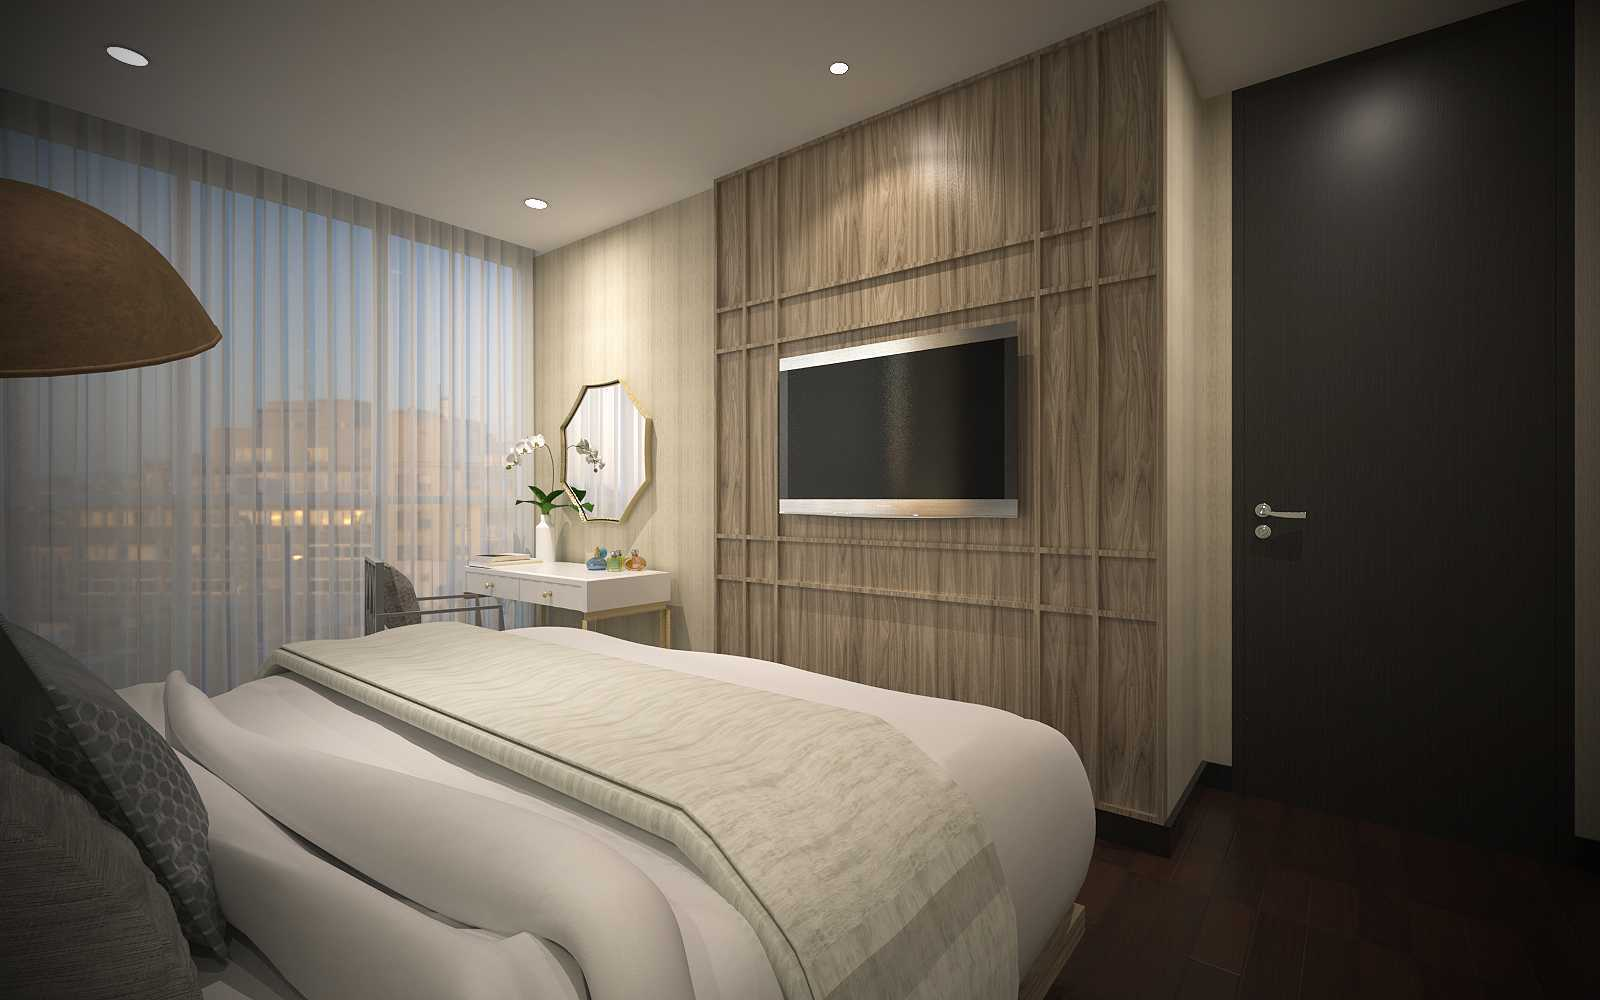 Pt. Garisprada Kemang Village Apartment Kemang Village Jakarta Kemang Village Jakarta Bedroom Modern  25502